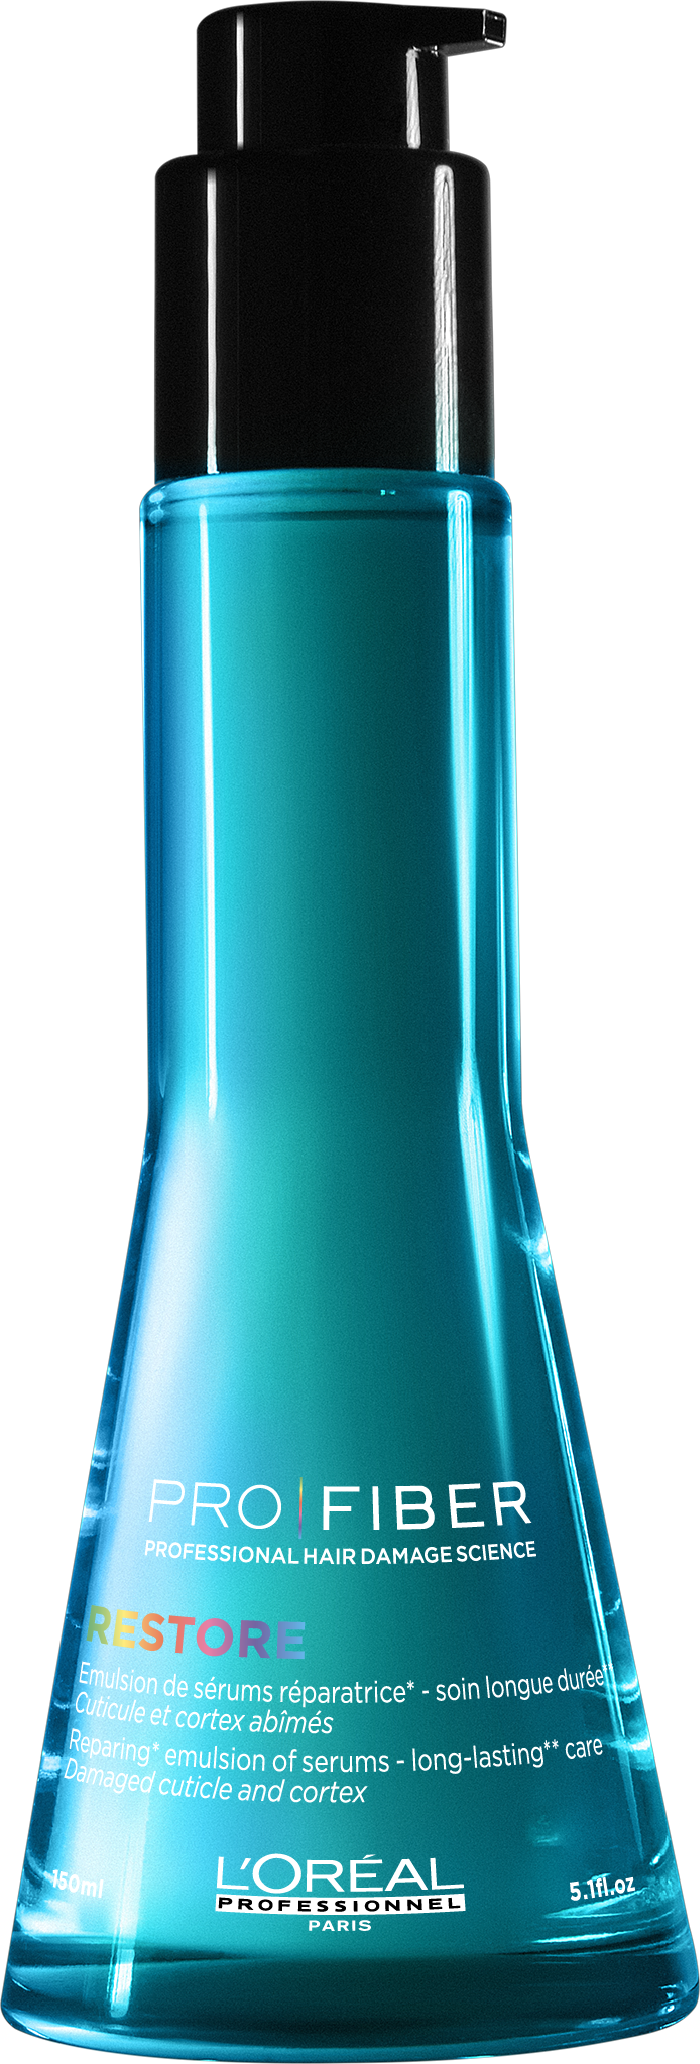 L'Oréal Professionnel PROFIBER Restore Repairing emulsion